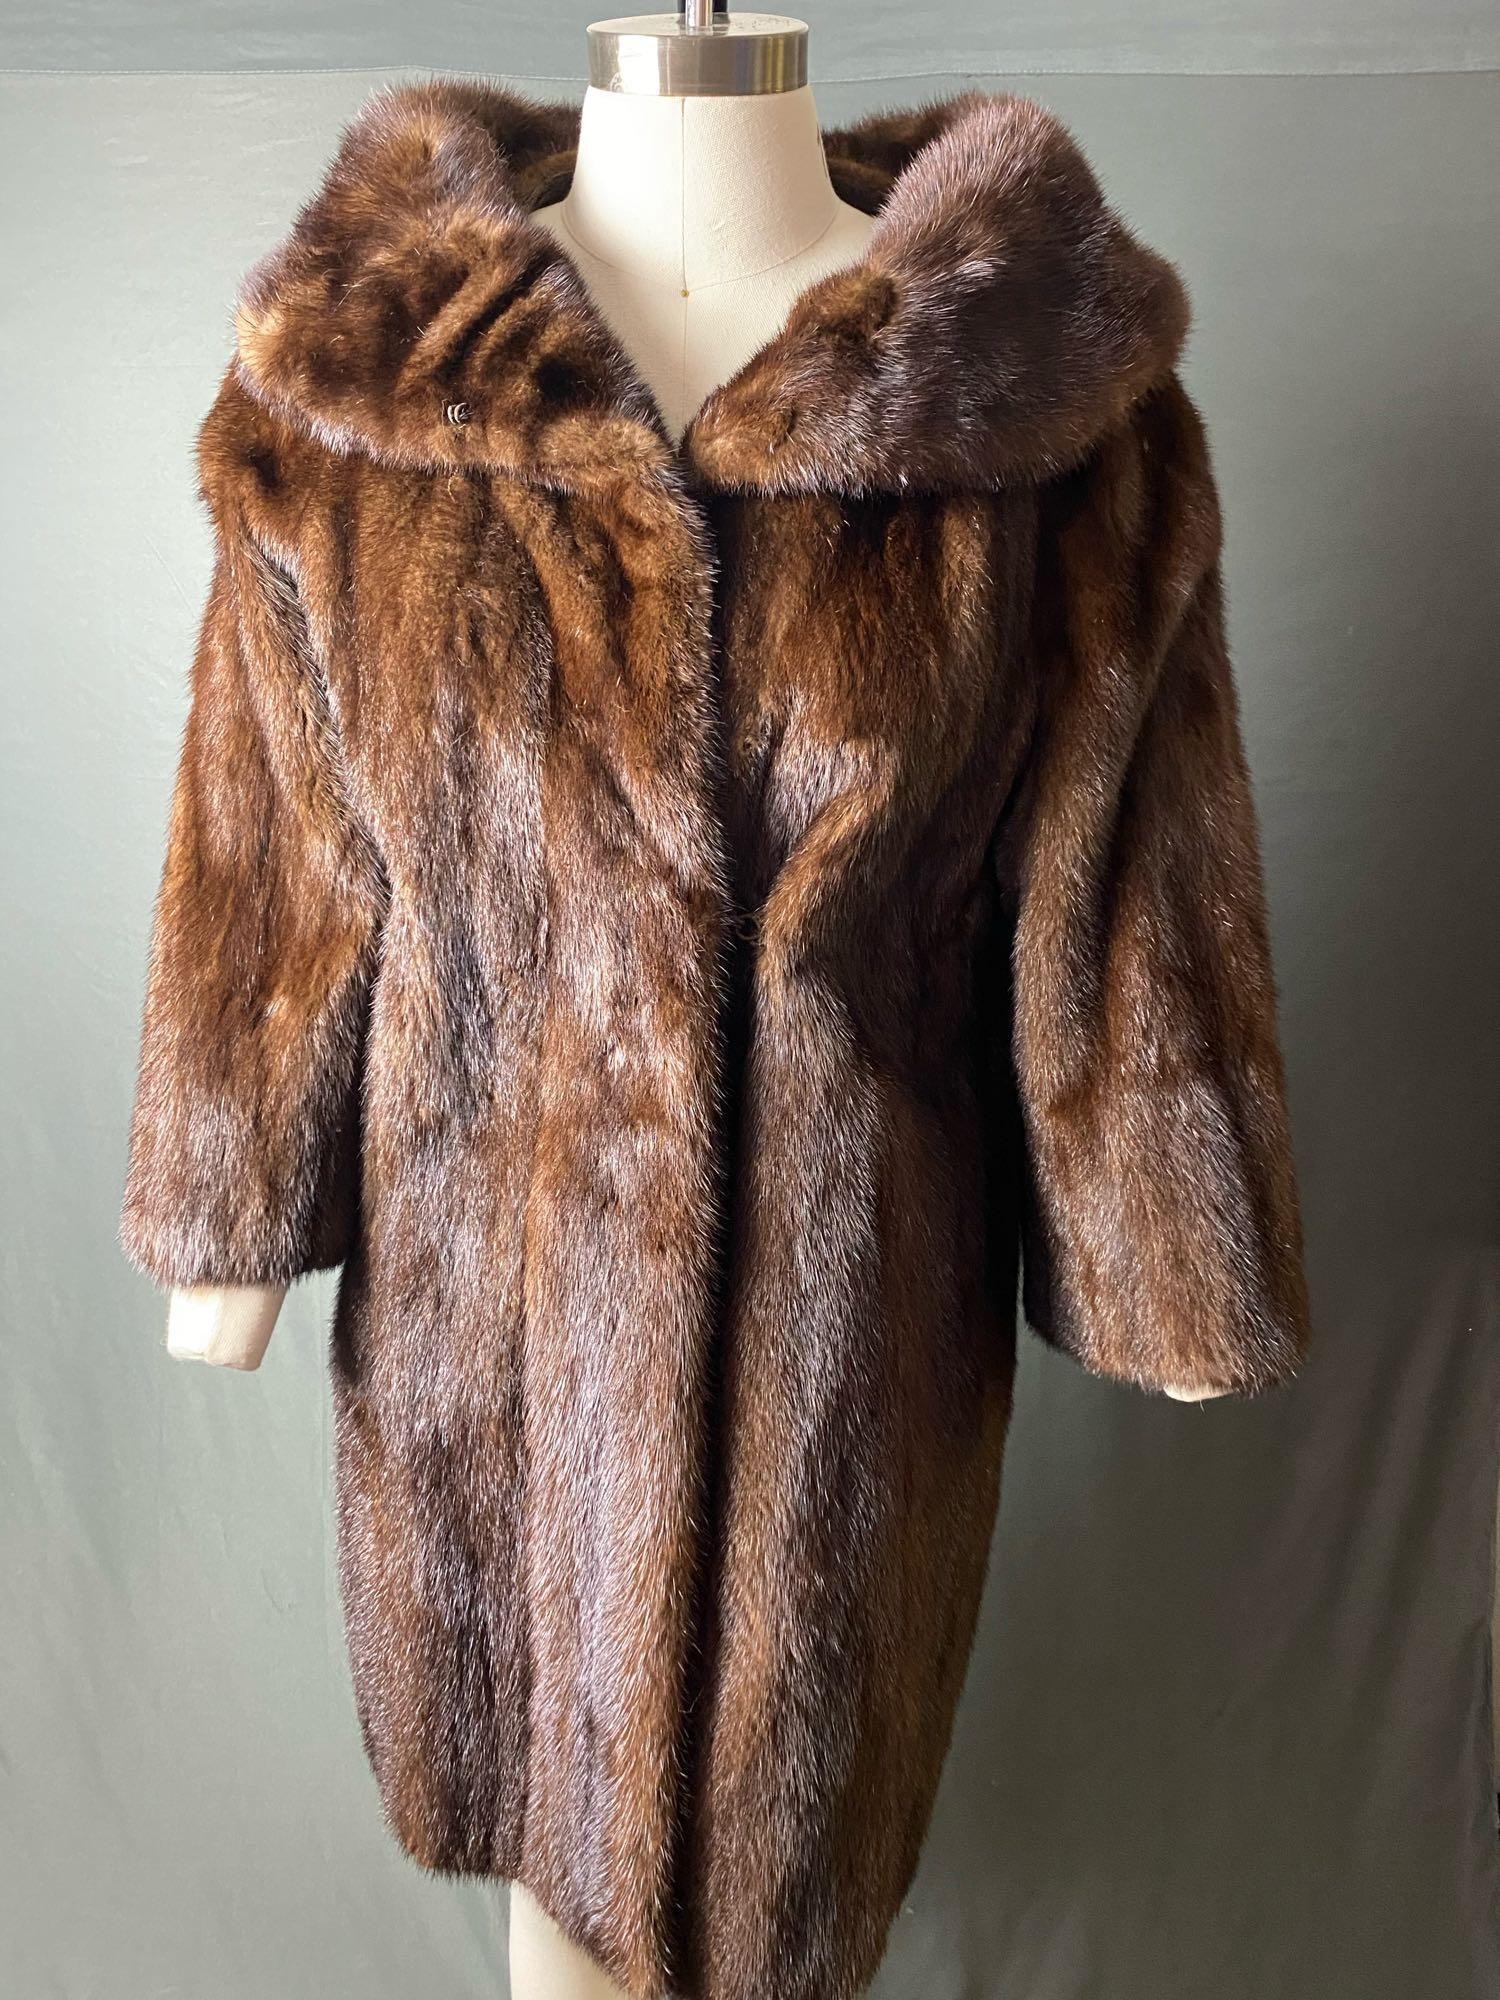 Vintage Authentic Dark Brown 3/4 Length Fur Coat